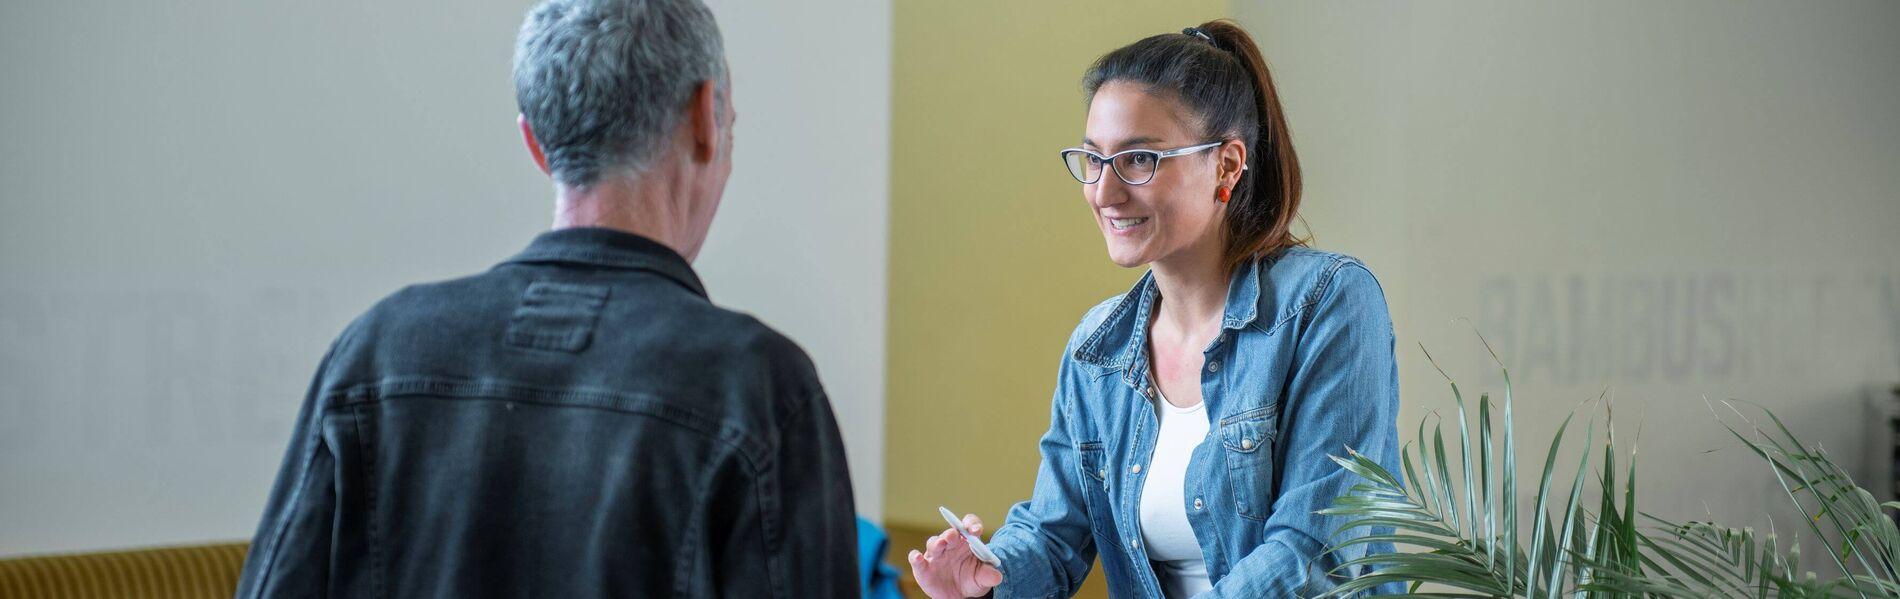 beratungsszene-mentoring-tandem-benevol-12